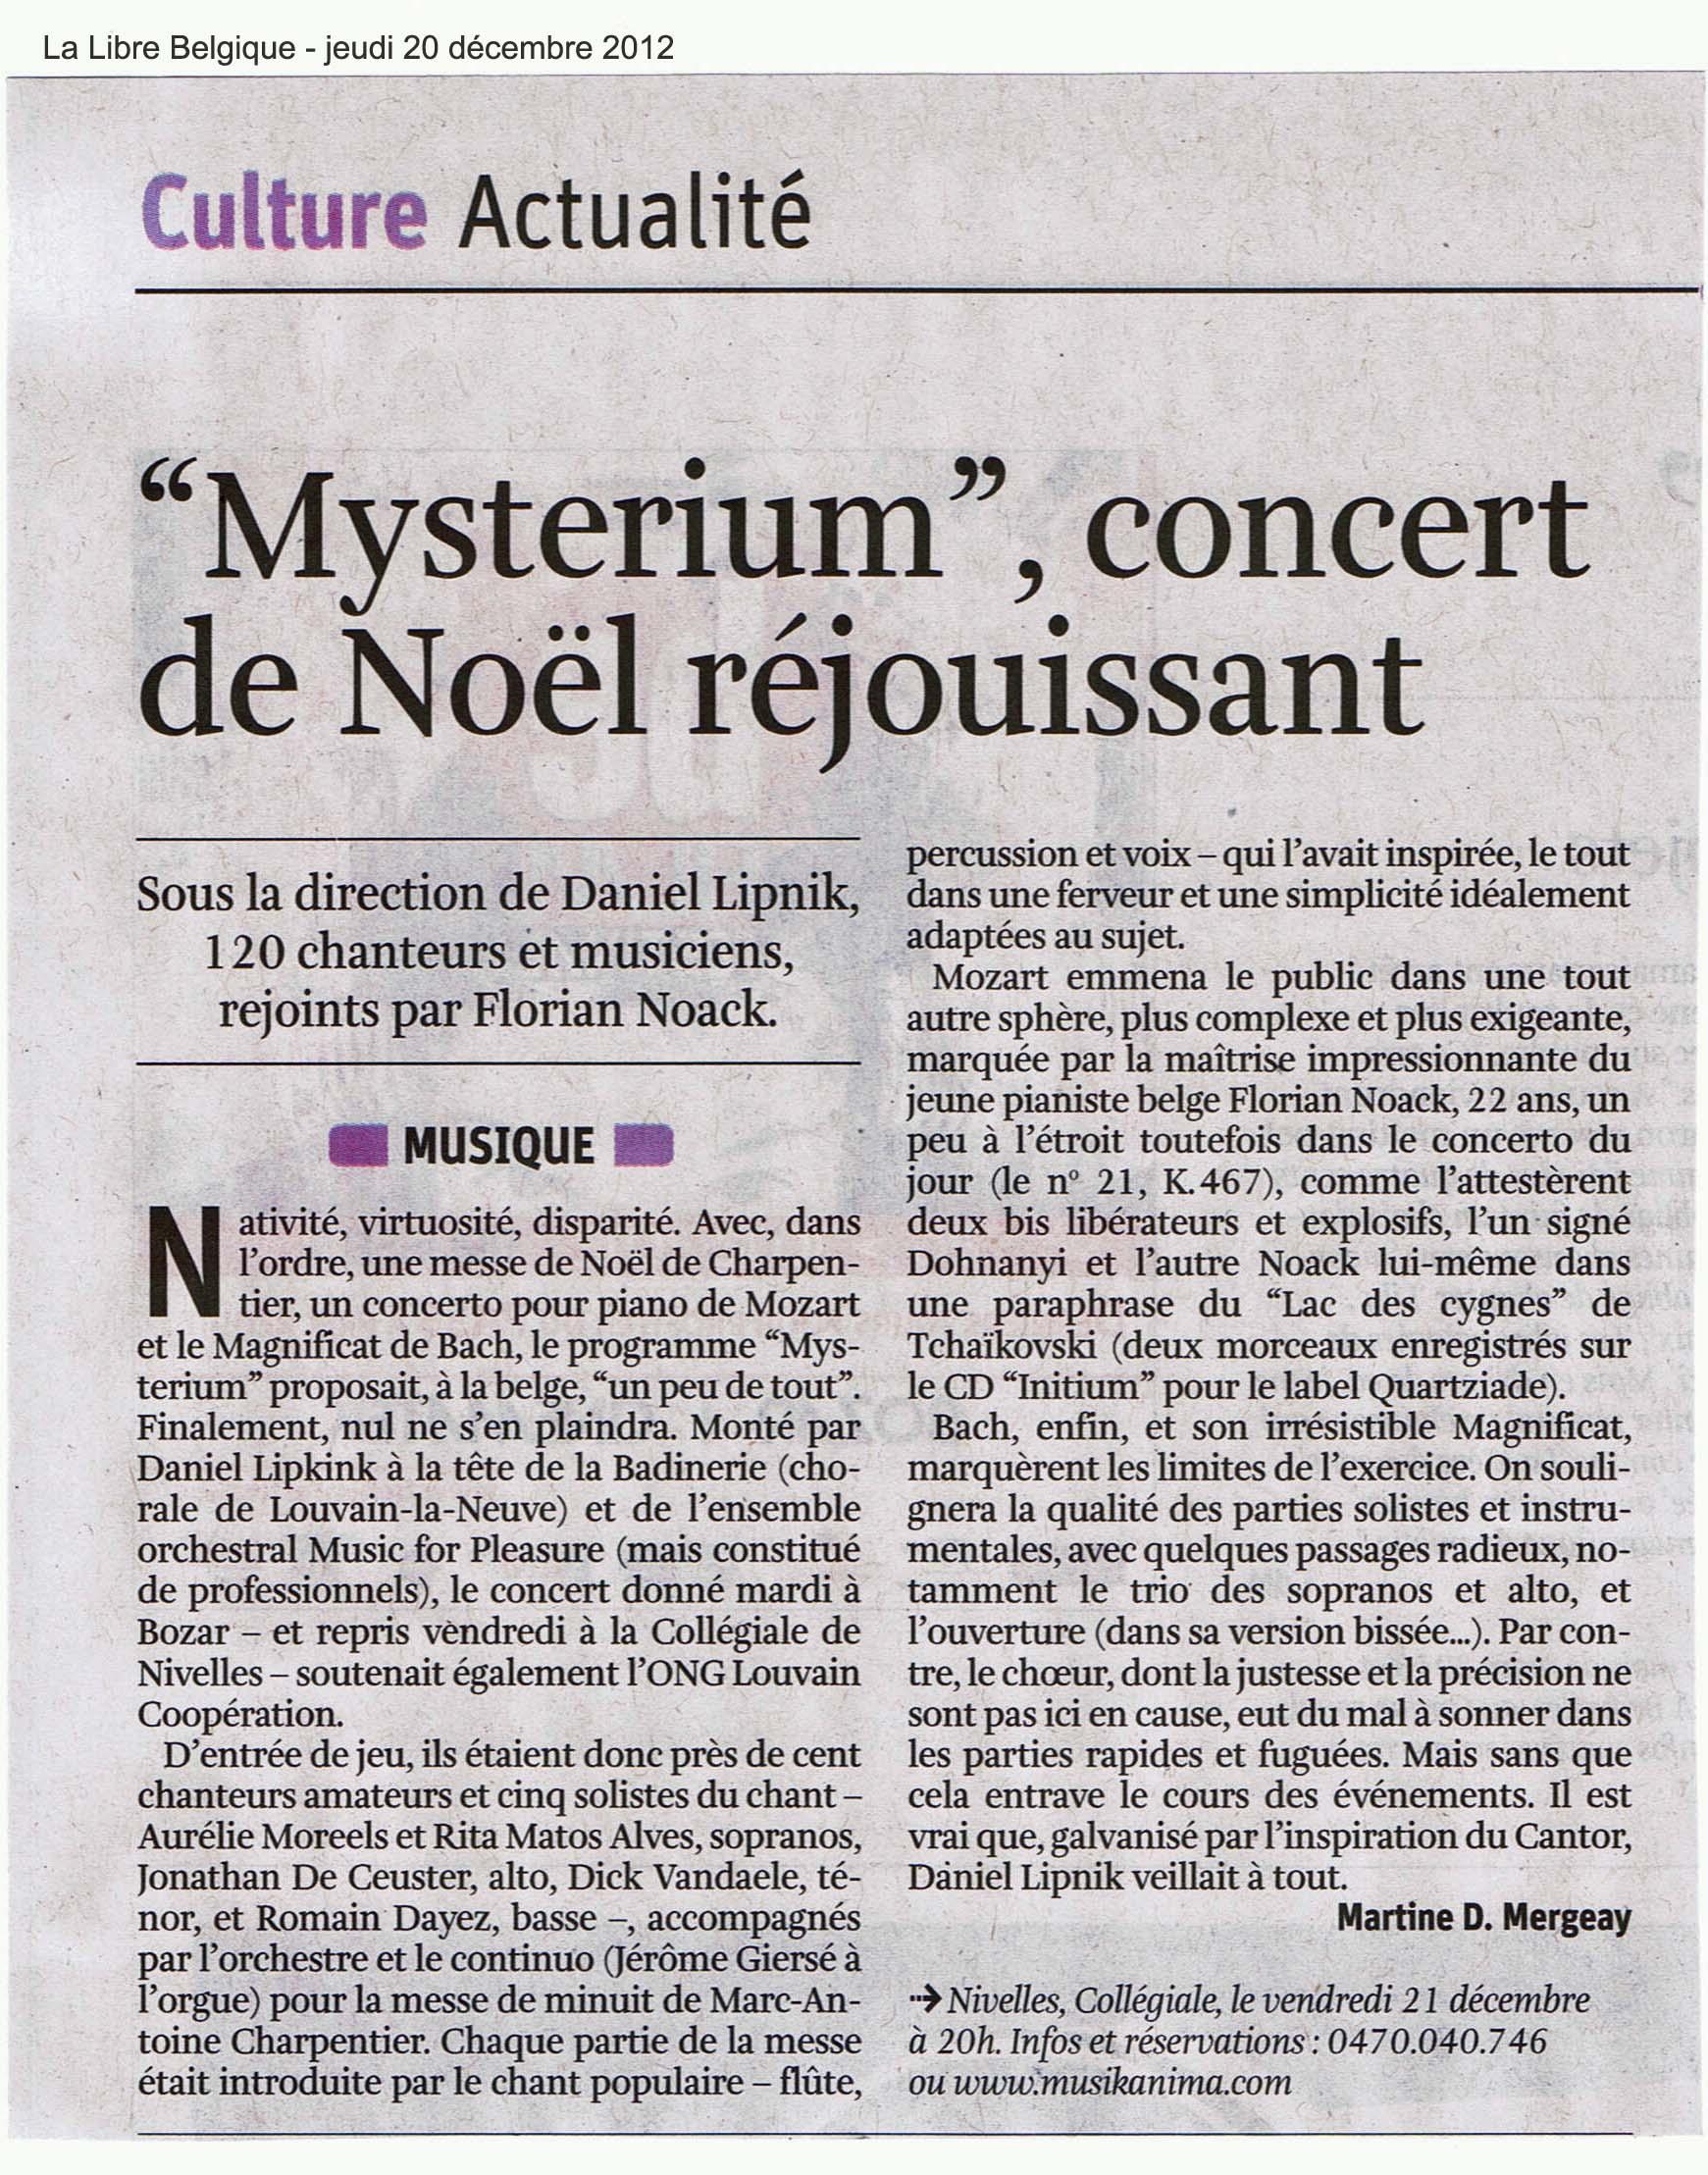 article Mysterium LB 20 12 2012